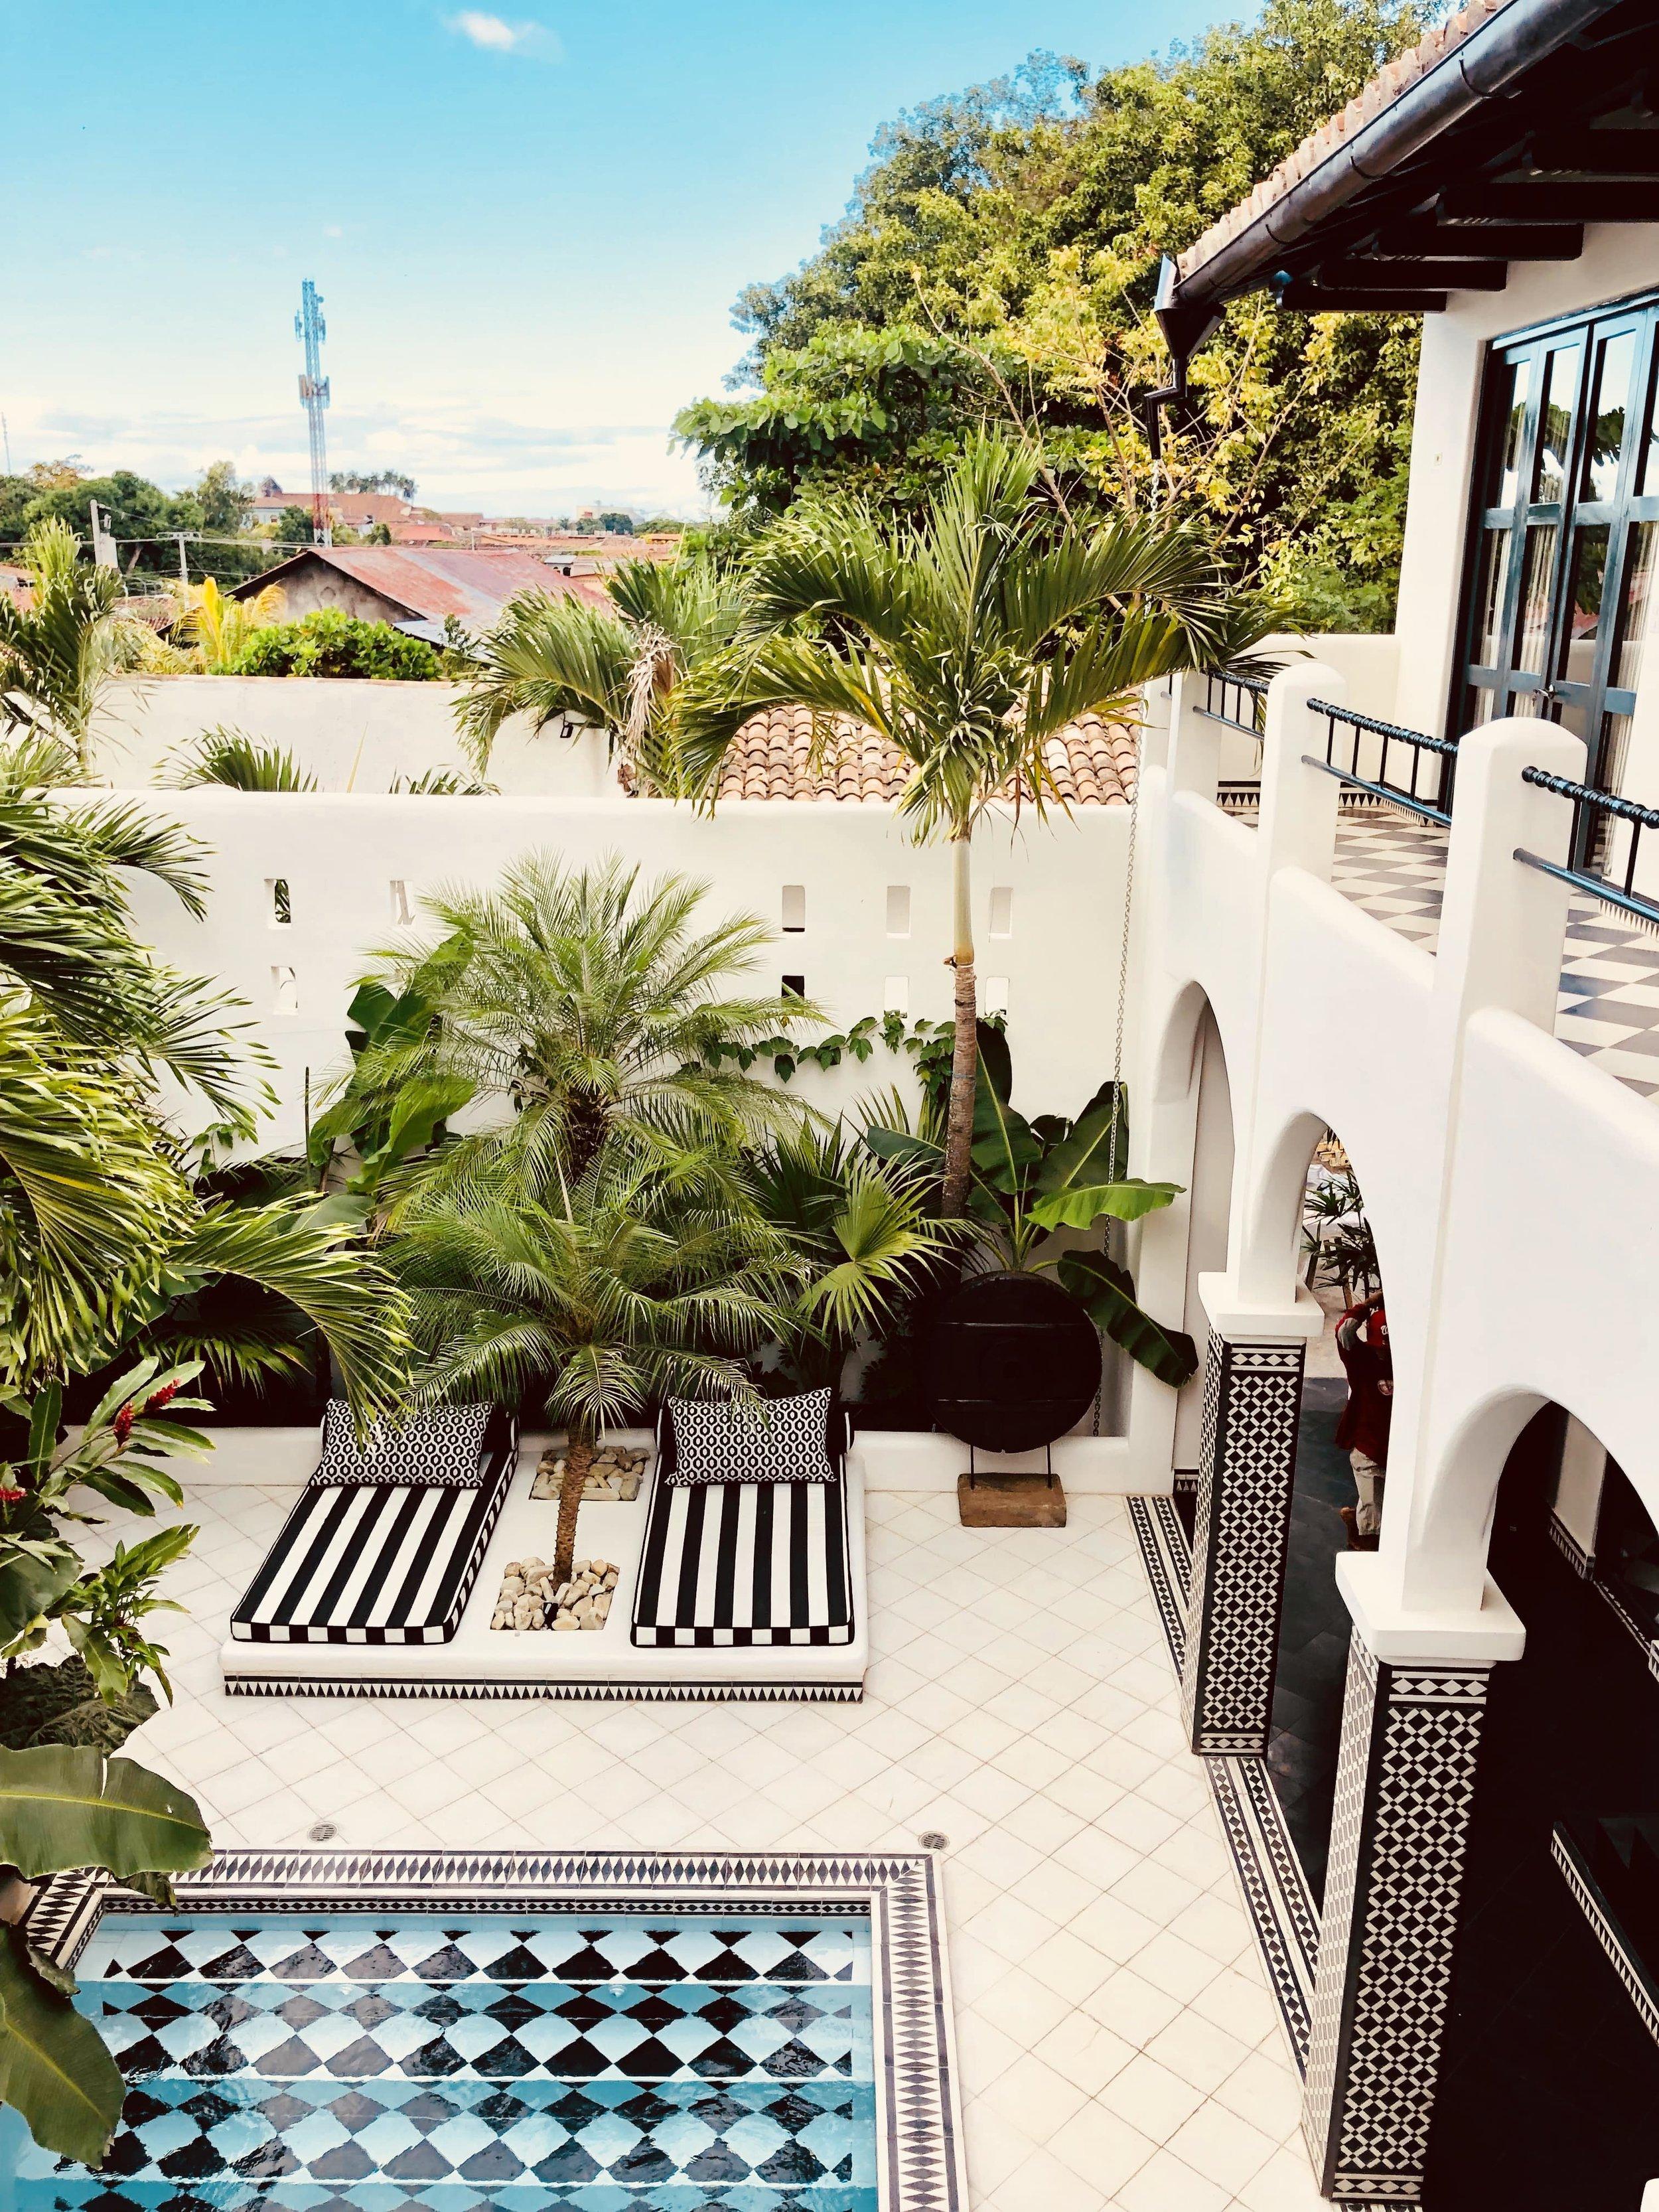 Real Estate For Sale Granada Nicaragua 9-min.jpeg